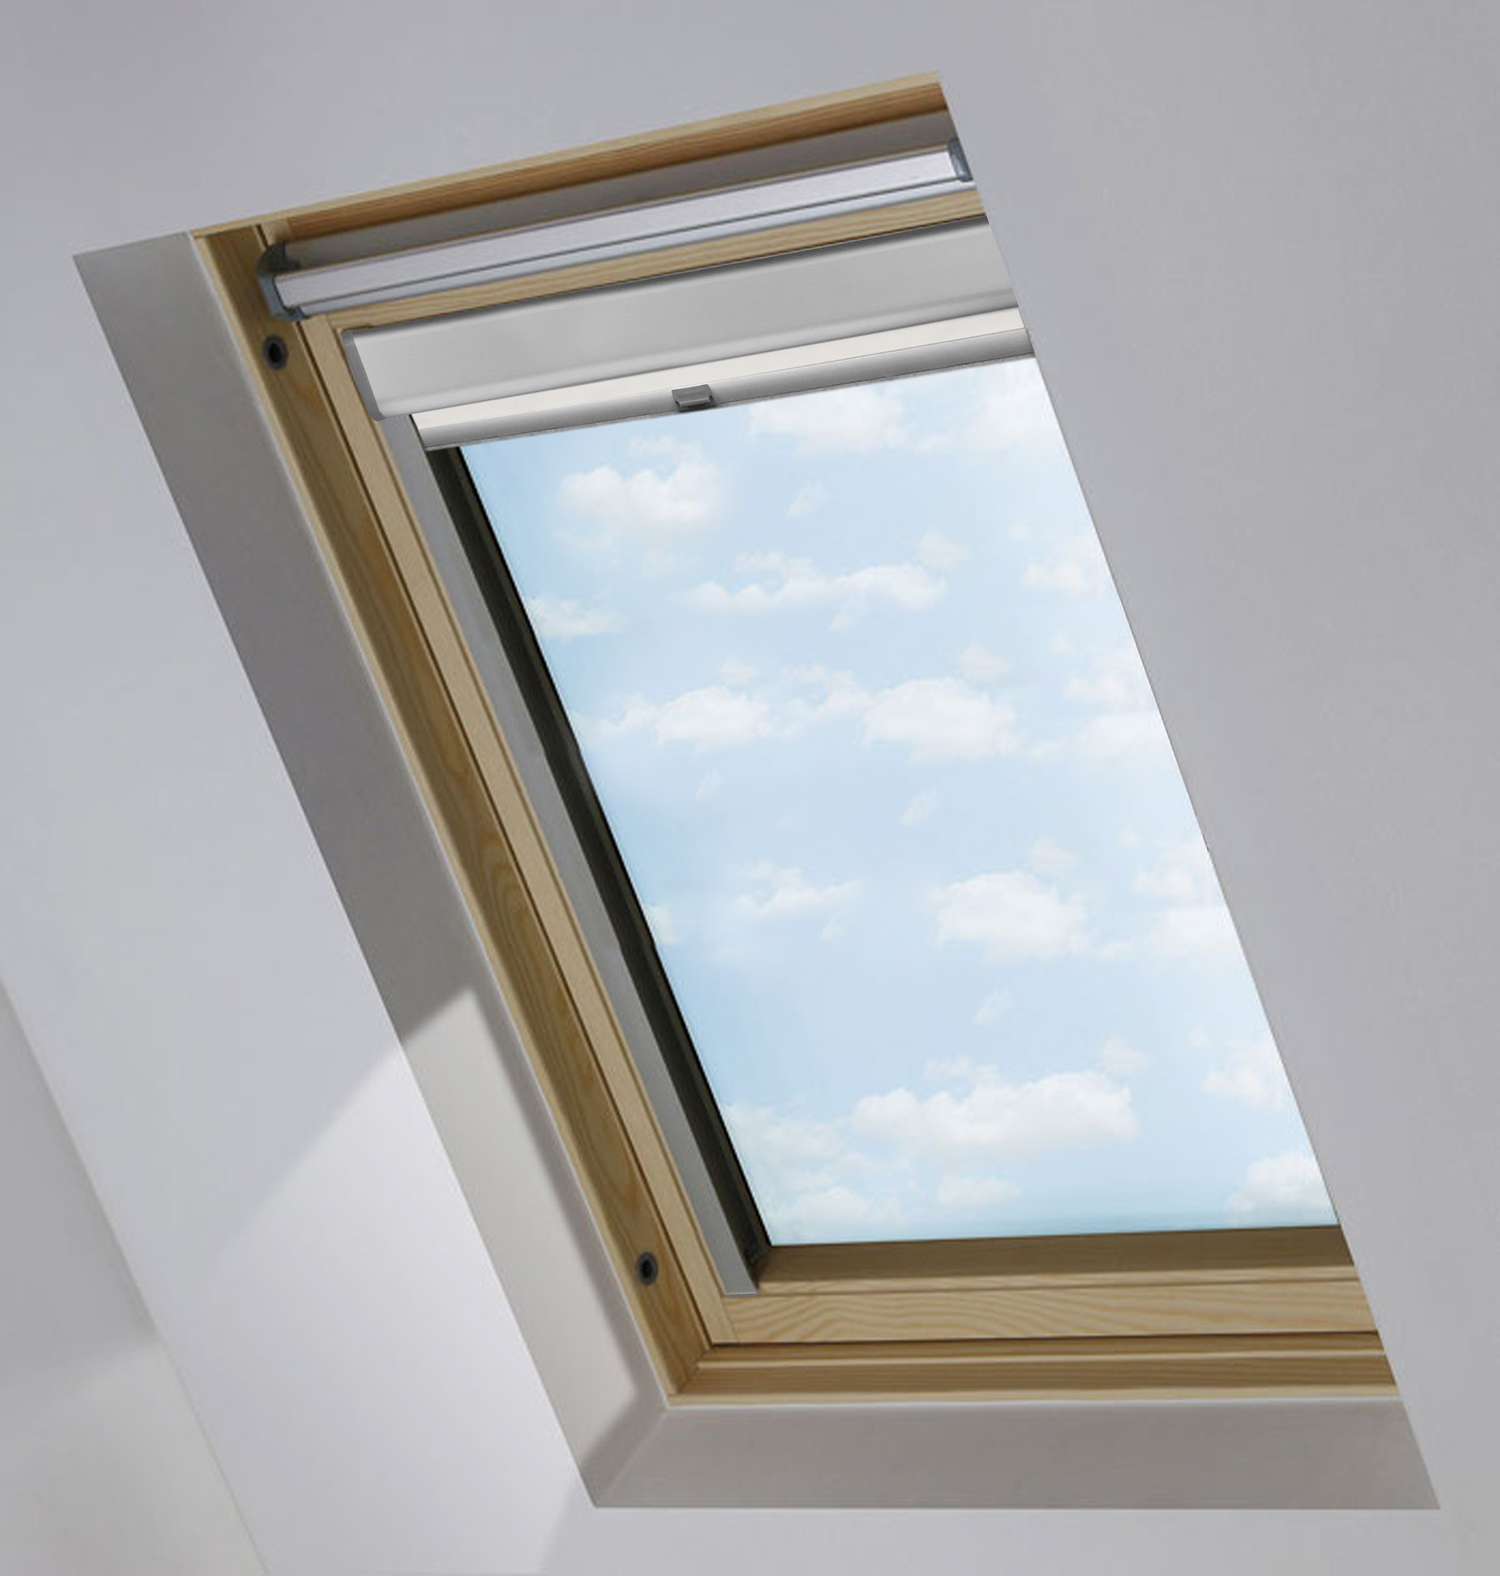 verdunkelungsrollo passend f r velux dachfenster thermorollo verdunkelung rollo ebay. Black Bedroom Furniture Sets. Home Design Ideas